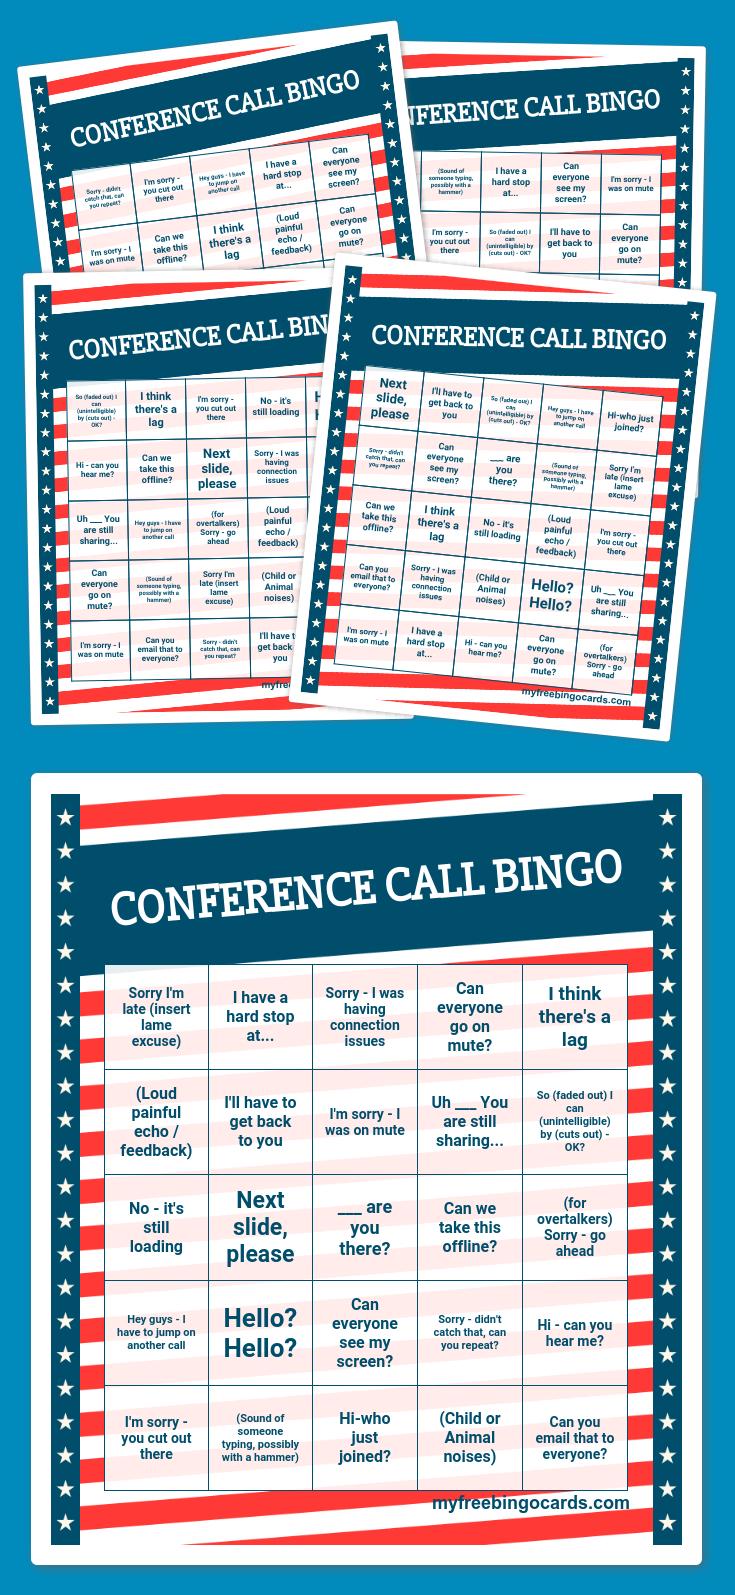 Conference Call Bingo | Bingo Card Generator, Free Printable